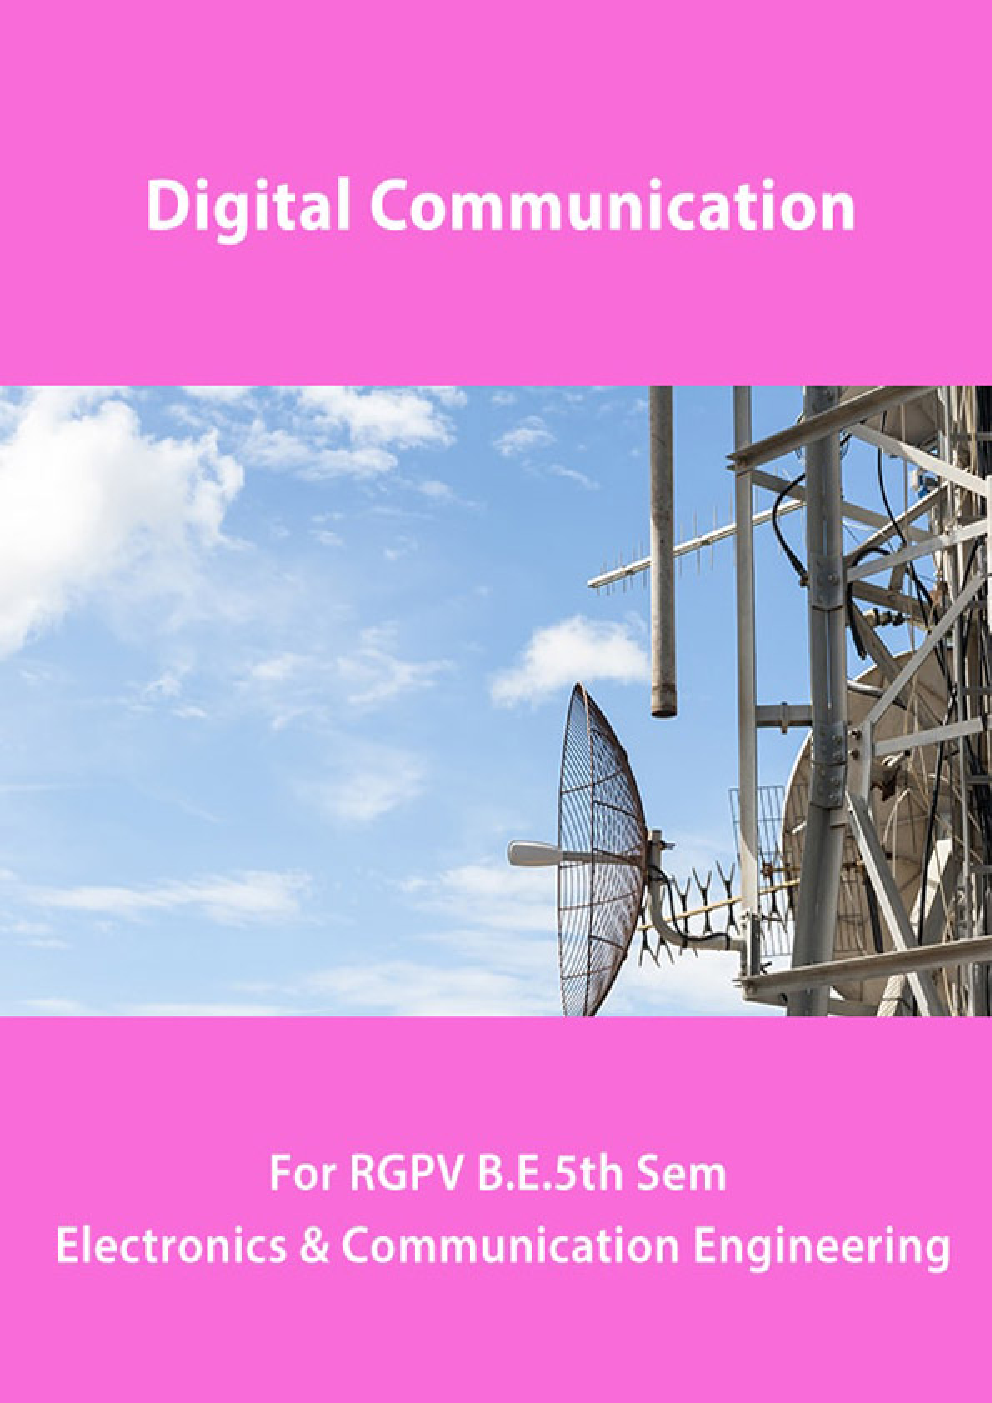 Digital Communication For RGPV B.E. 5th Sem Electronics & Communication Engineering - Page 1